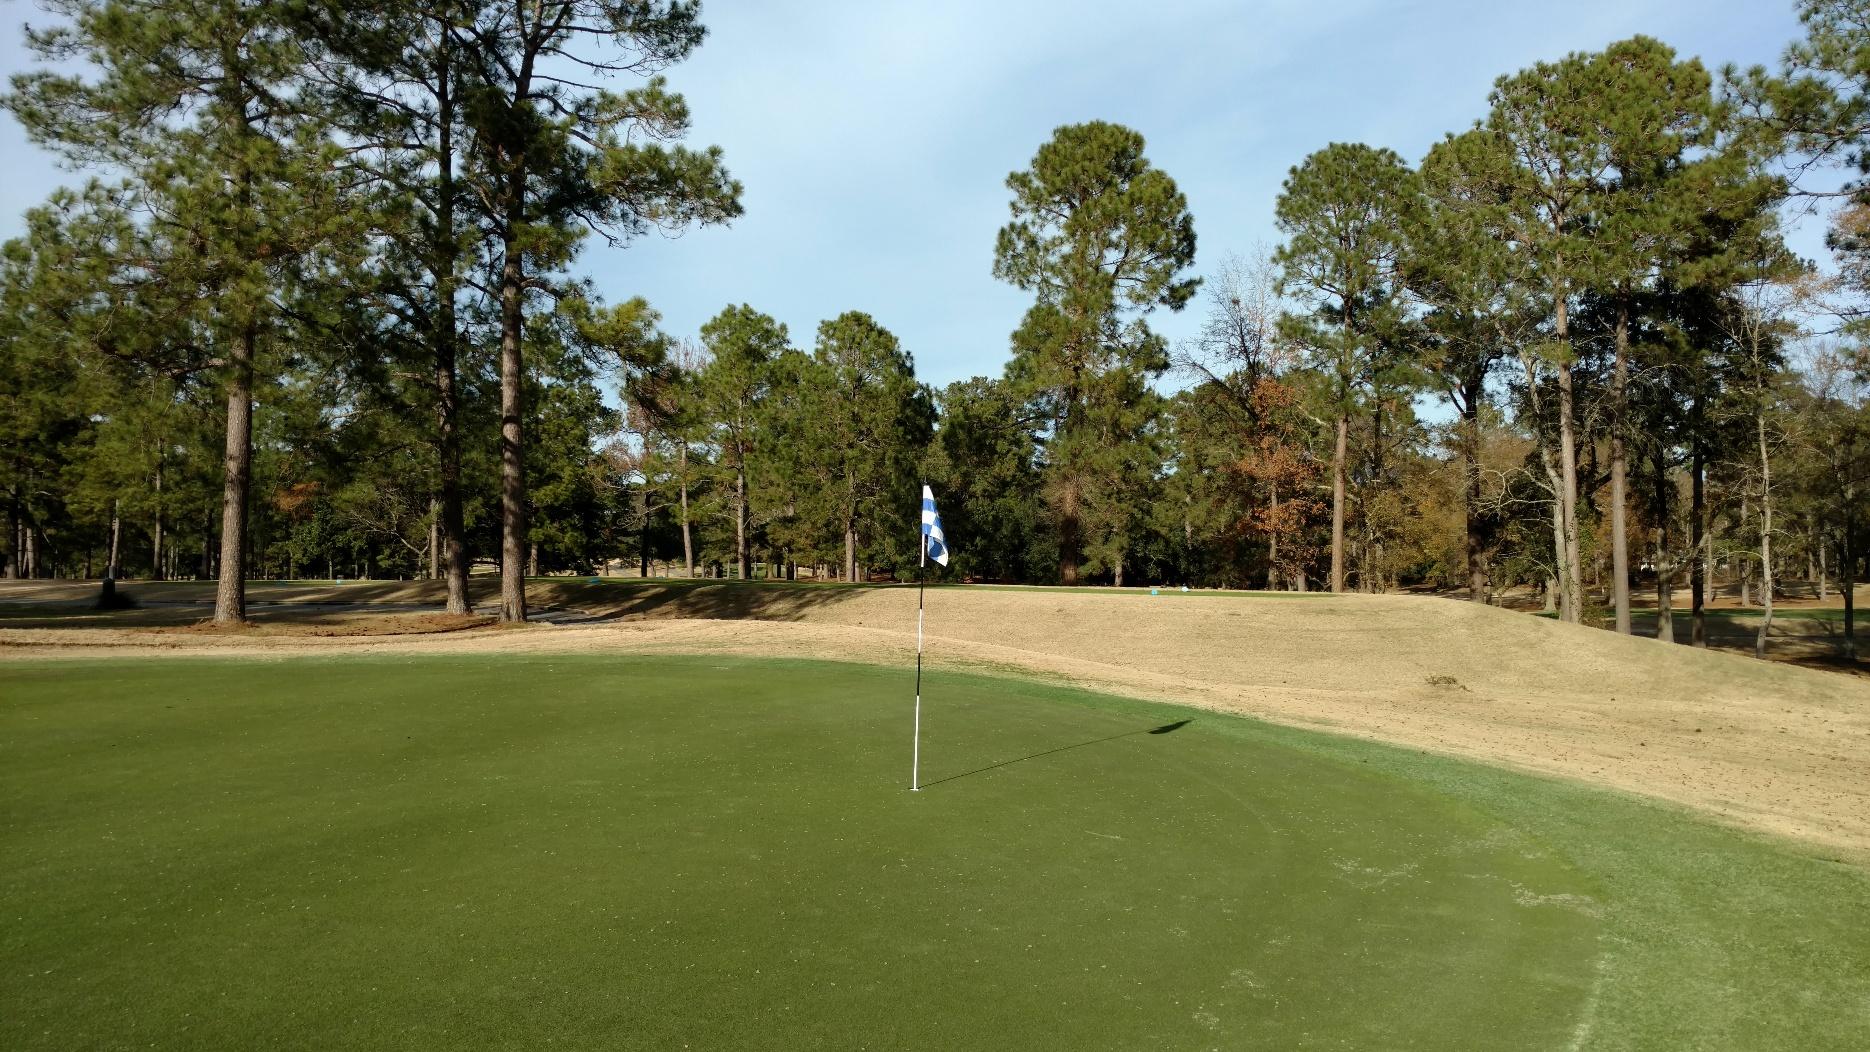 Lake Marion Golf Course (Santee, SC on 12/25/17)